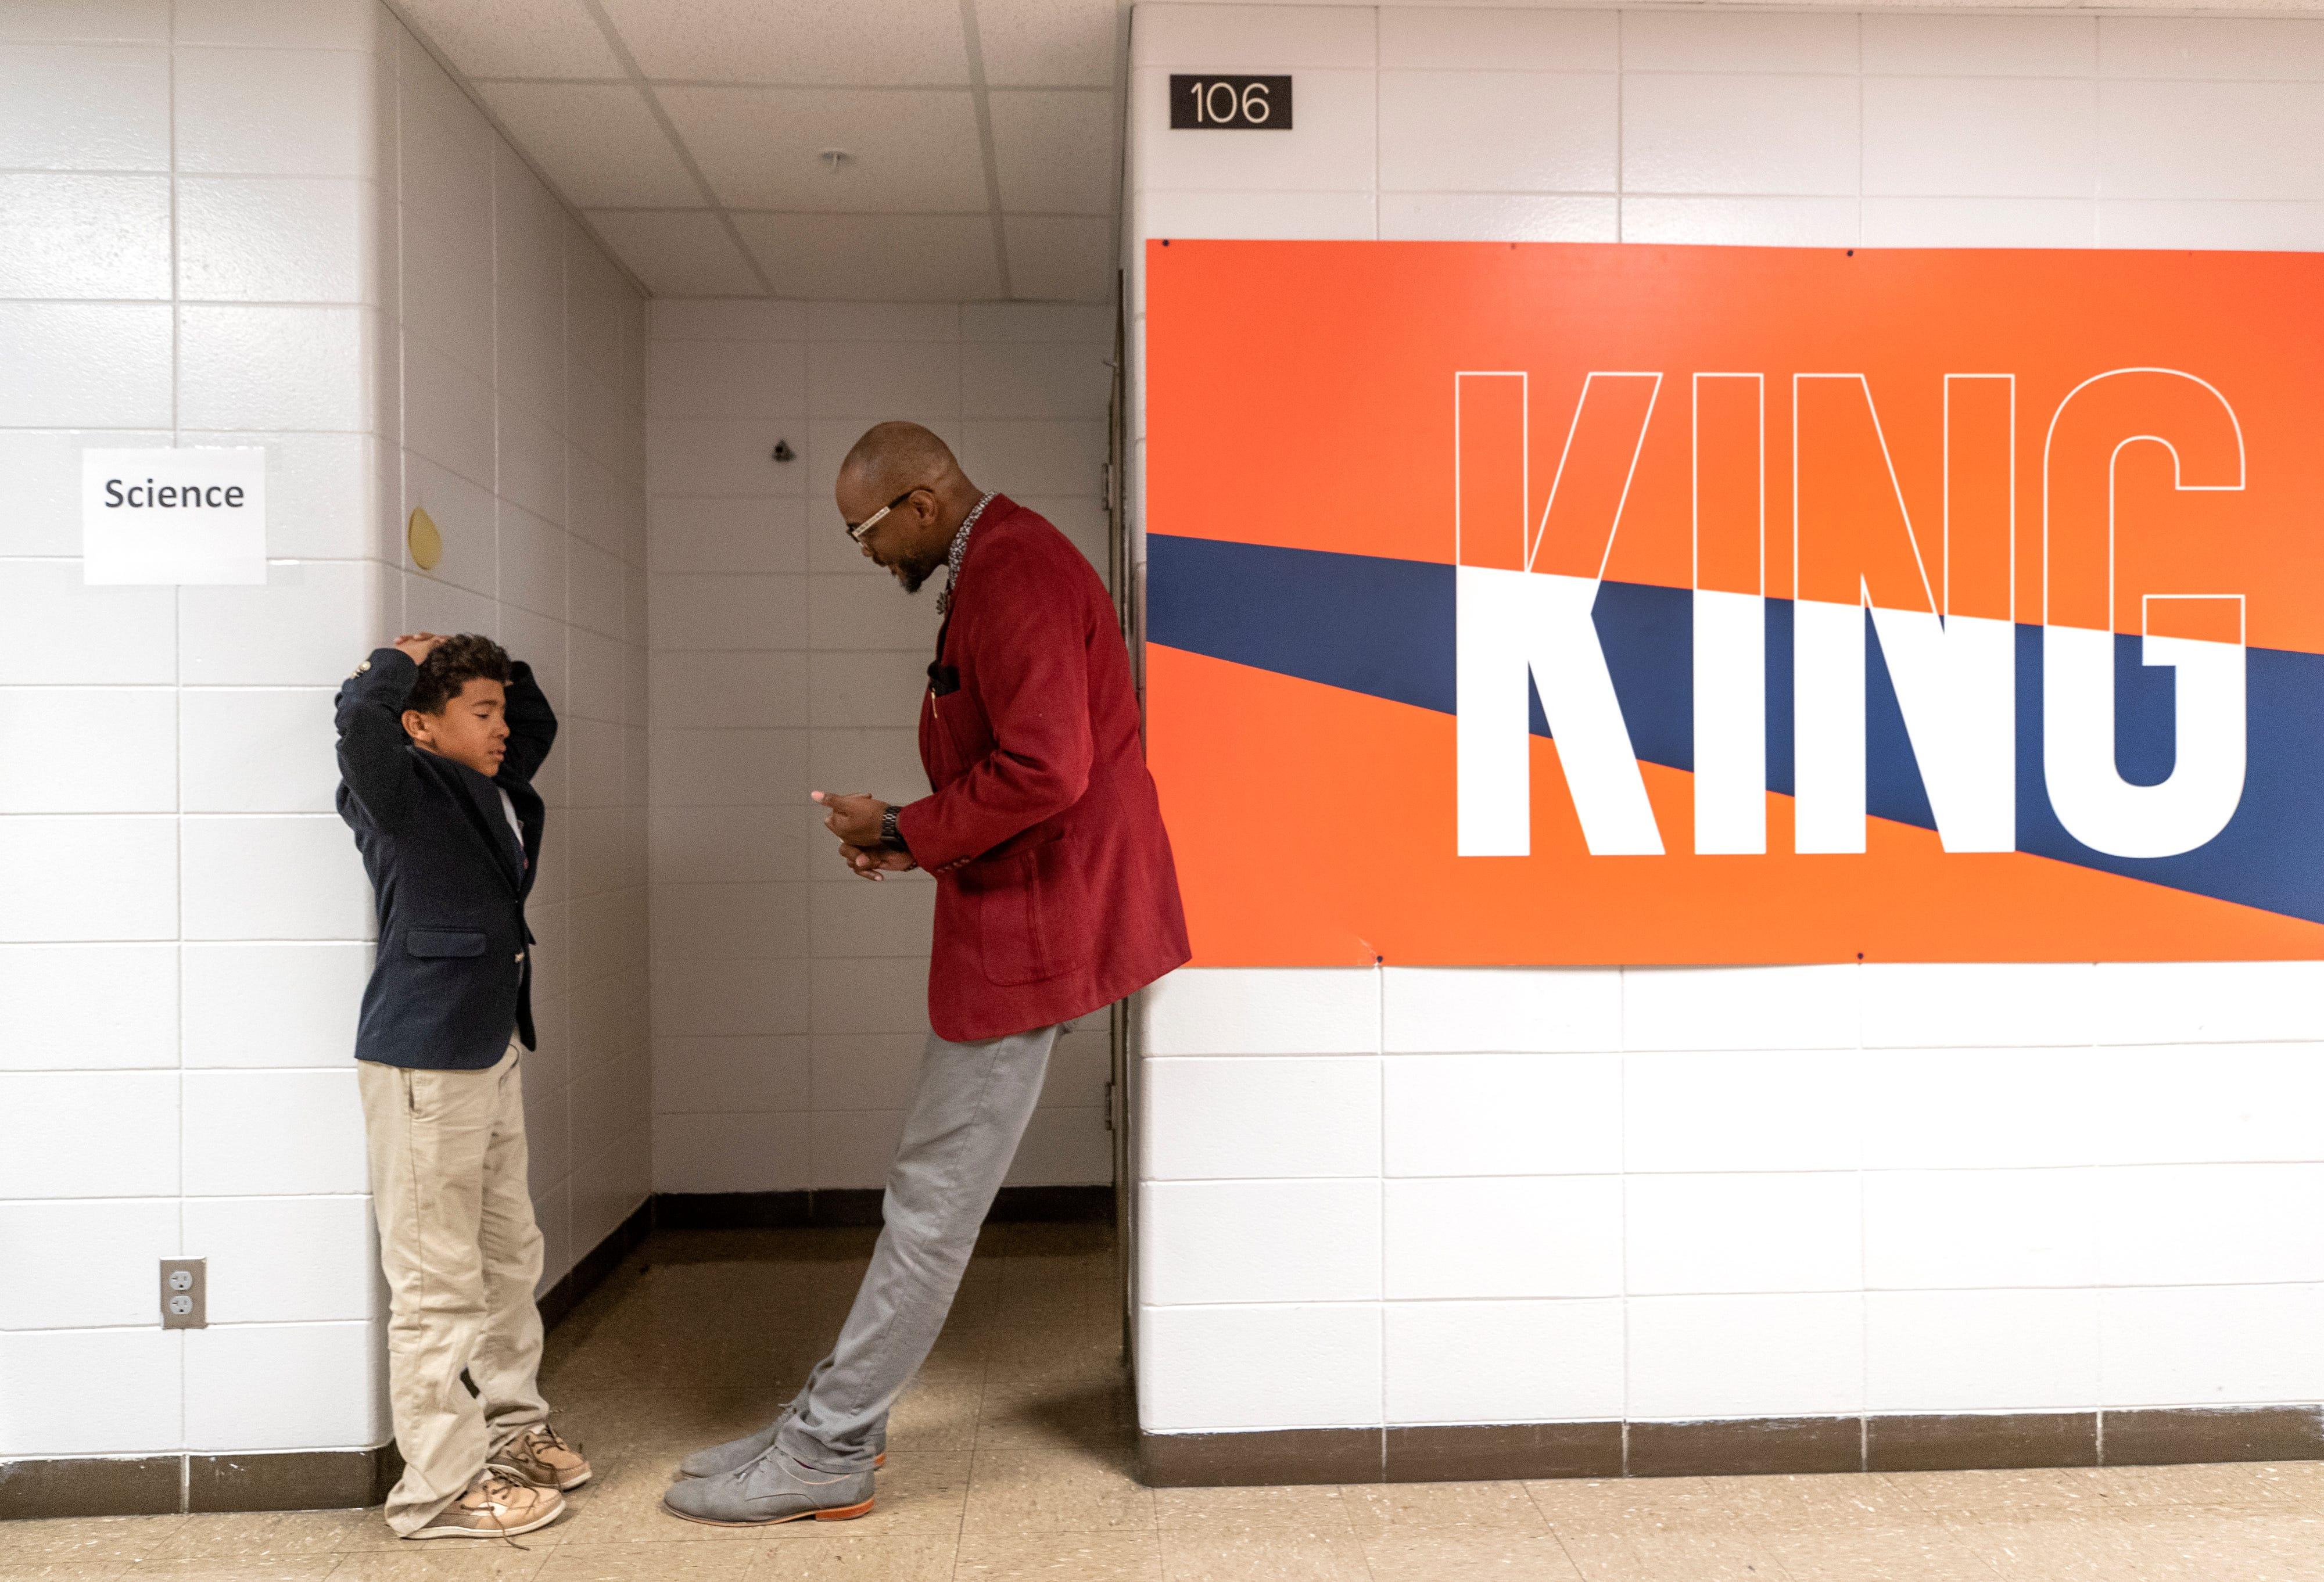 W.E.B. DuBois Academy ECE teacher Ellis Tarver talks with sixth grade student Jaden Parker in the hallway after an incident in the classroom. Oct. 17, 2019.